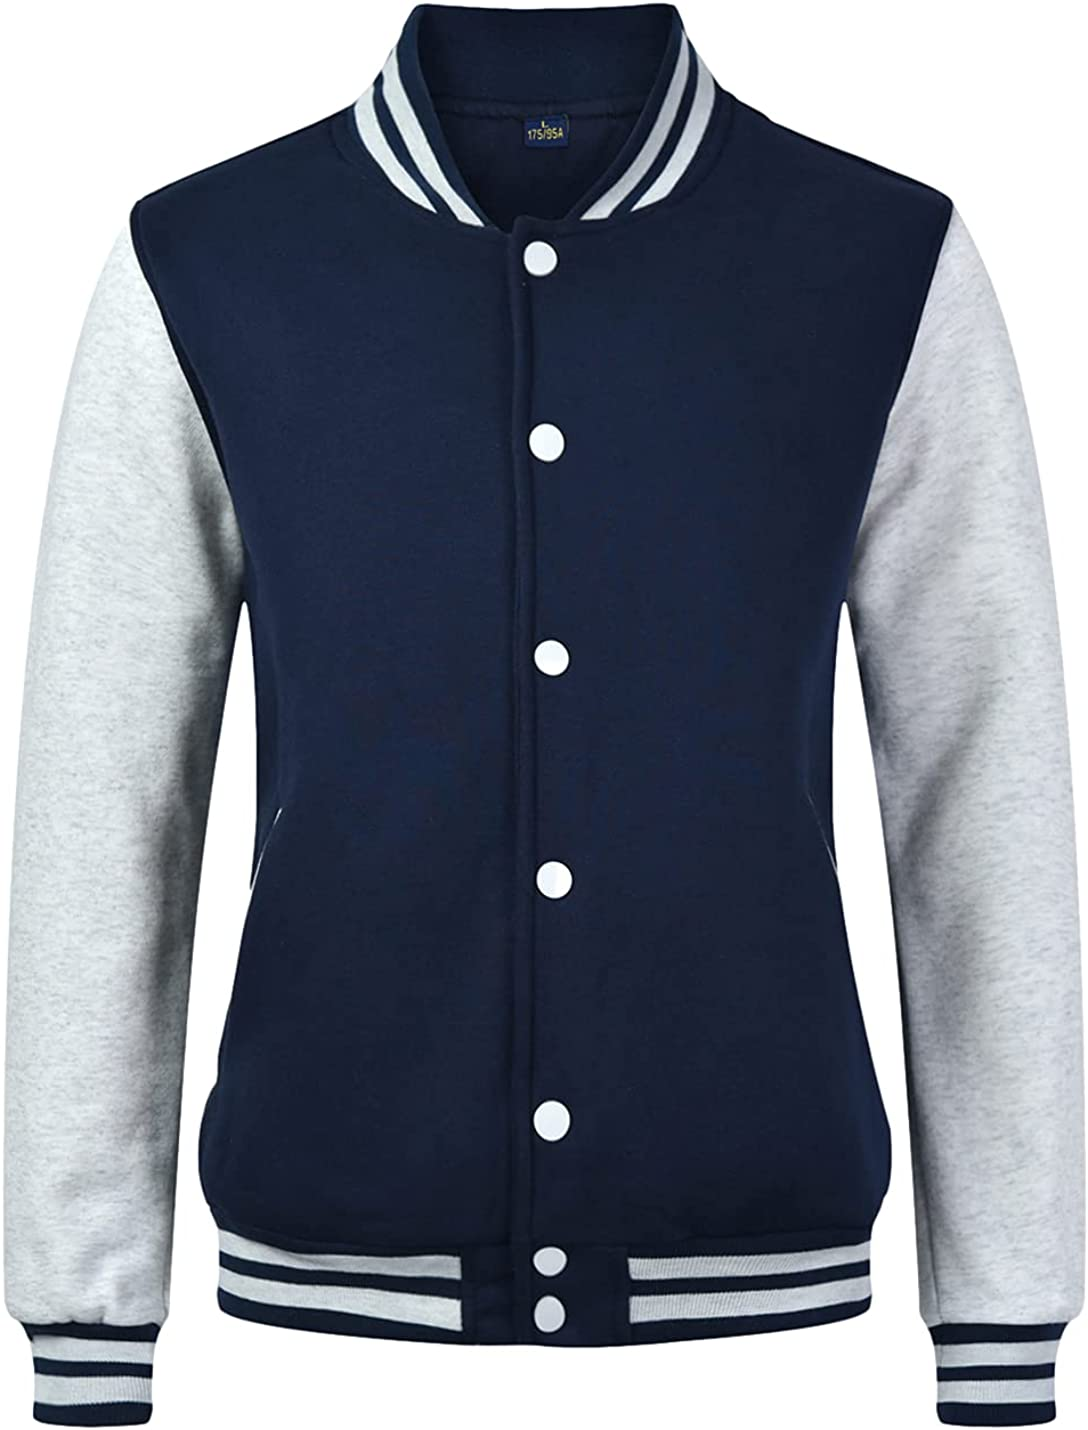 Omoone Finally popular brand Men's Casual Jackets Color New color Block Baseball Button Varsity